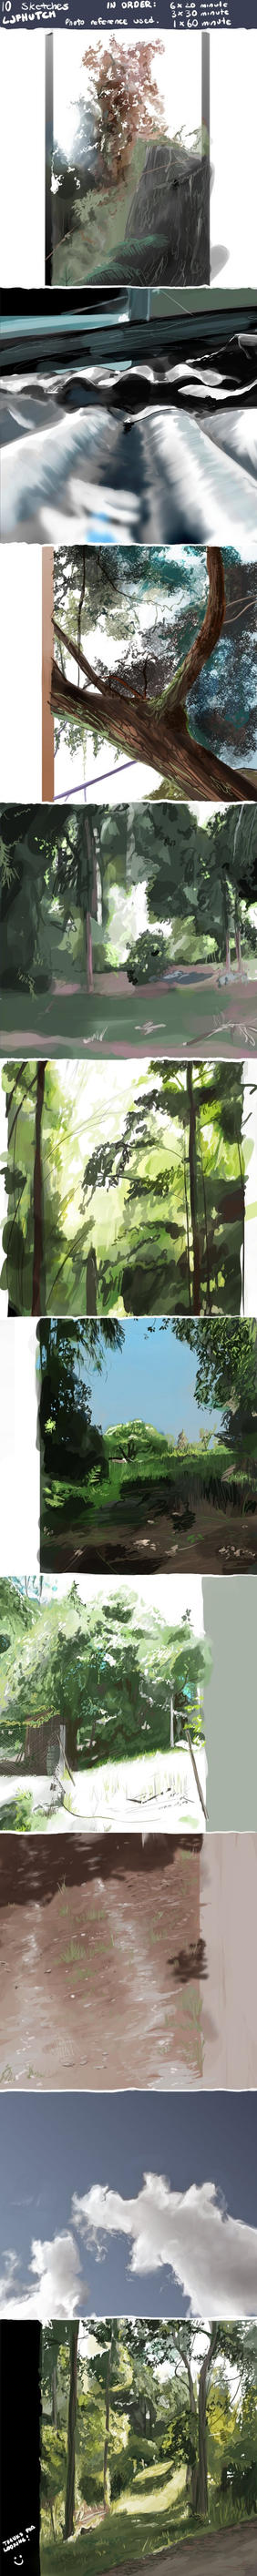 10 Studies - Compilation by LJFHutch